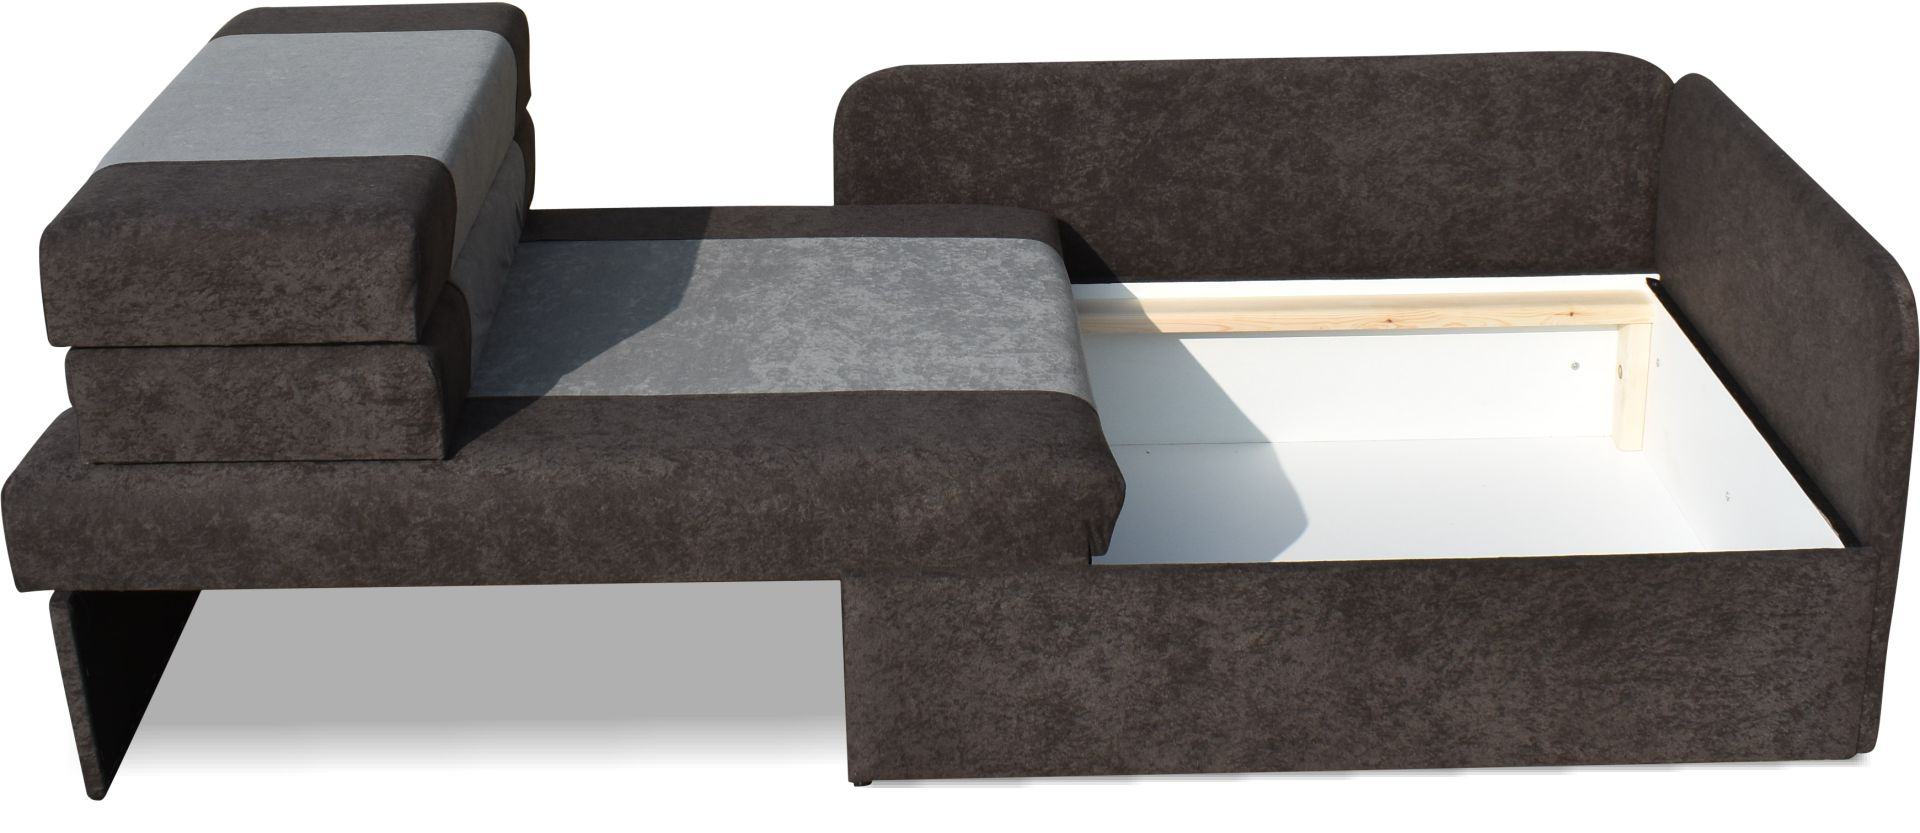 Sofa dla dzieci Latt